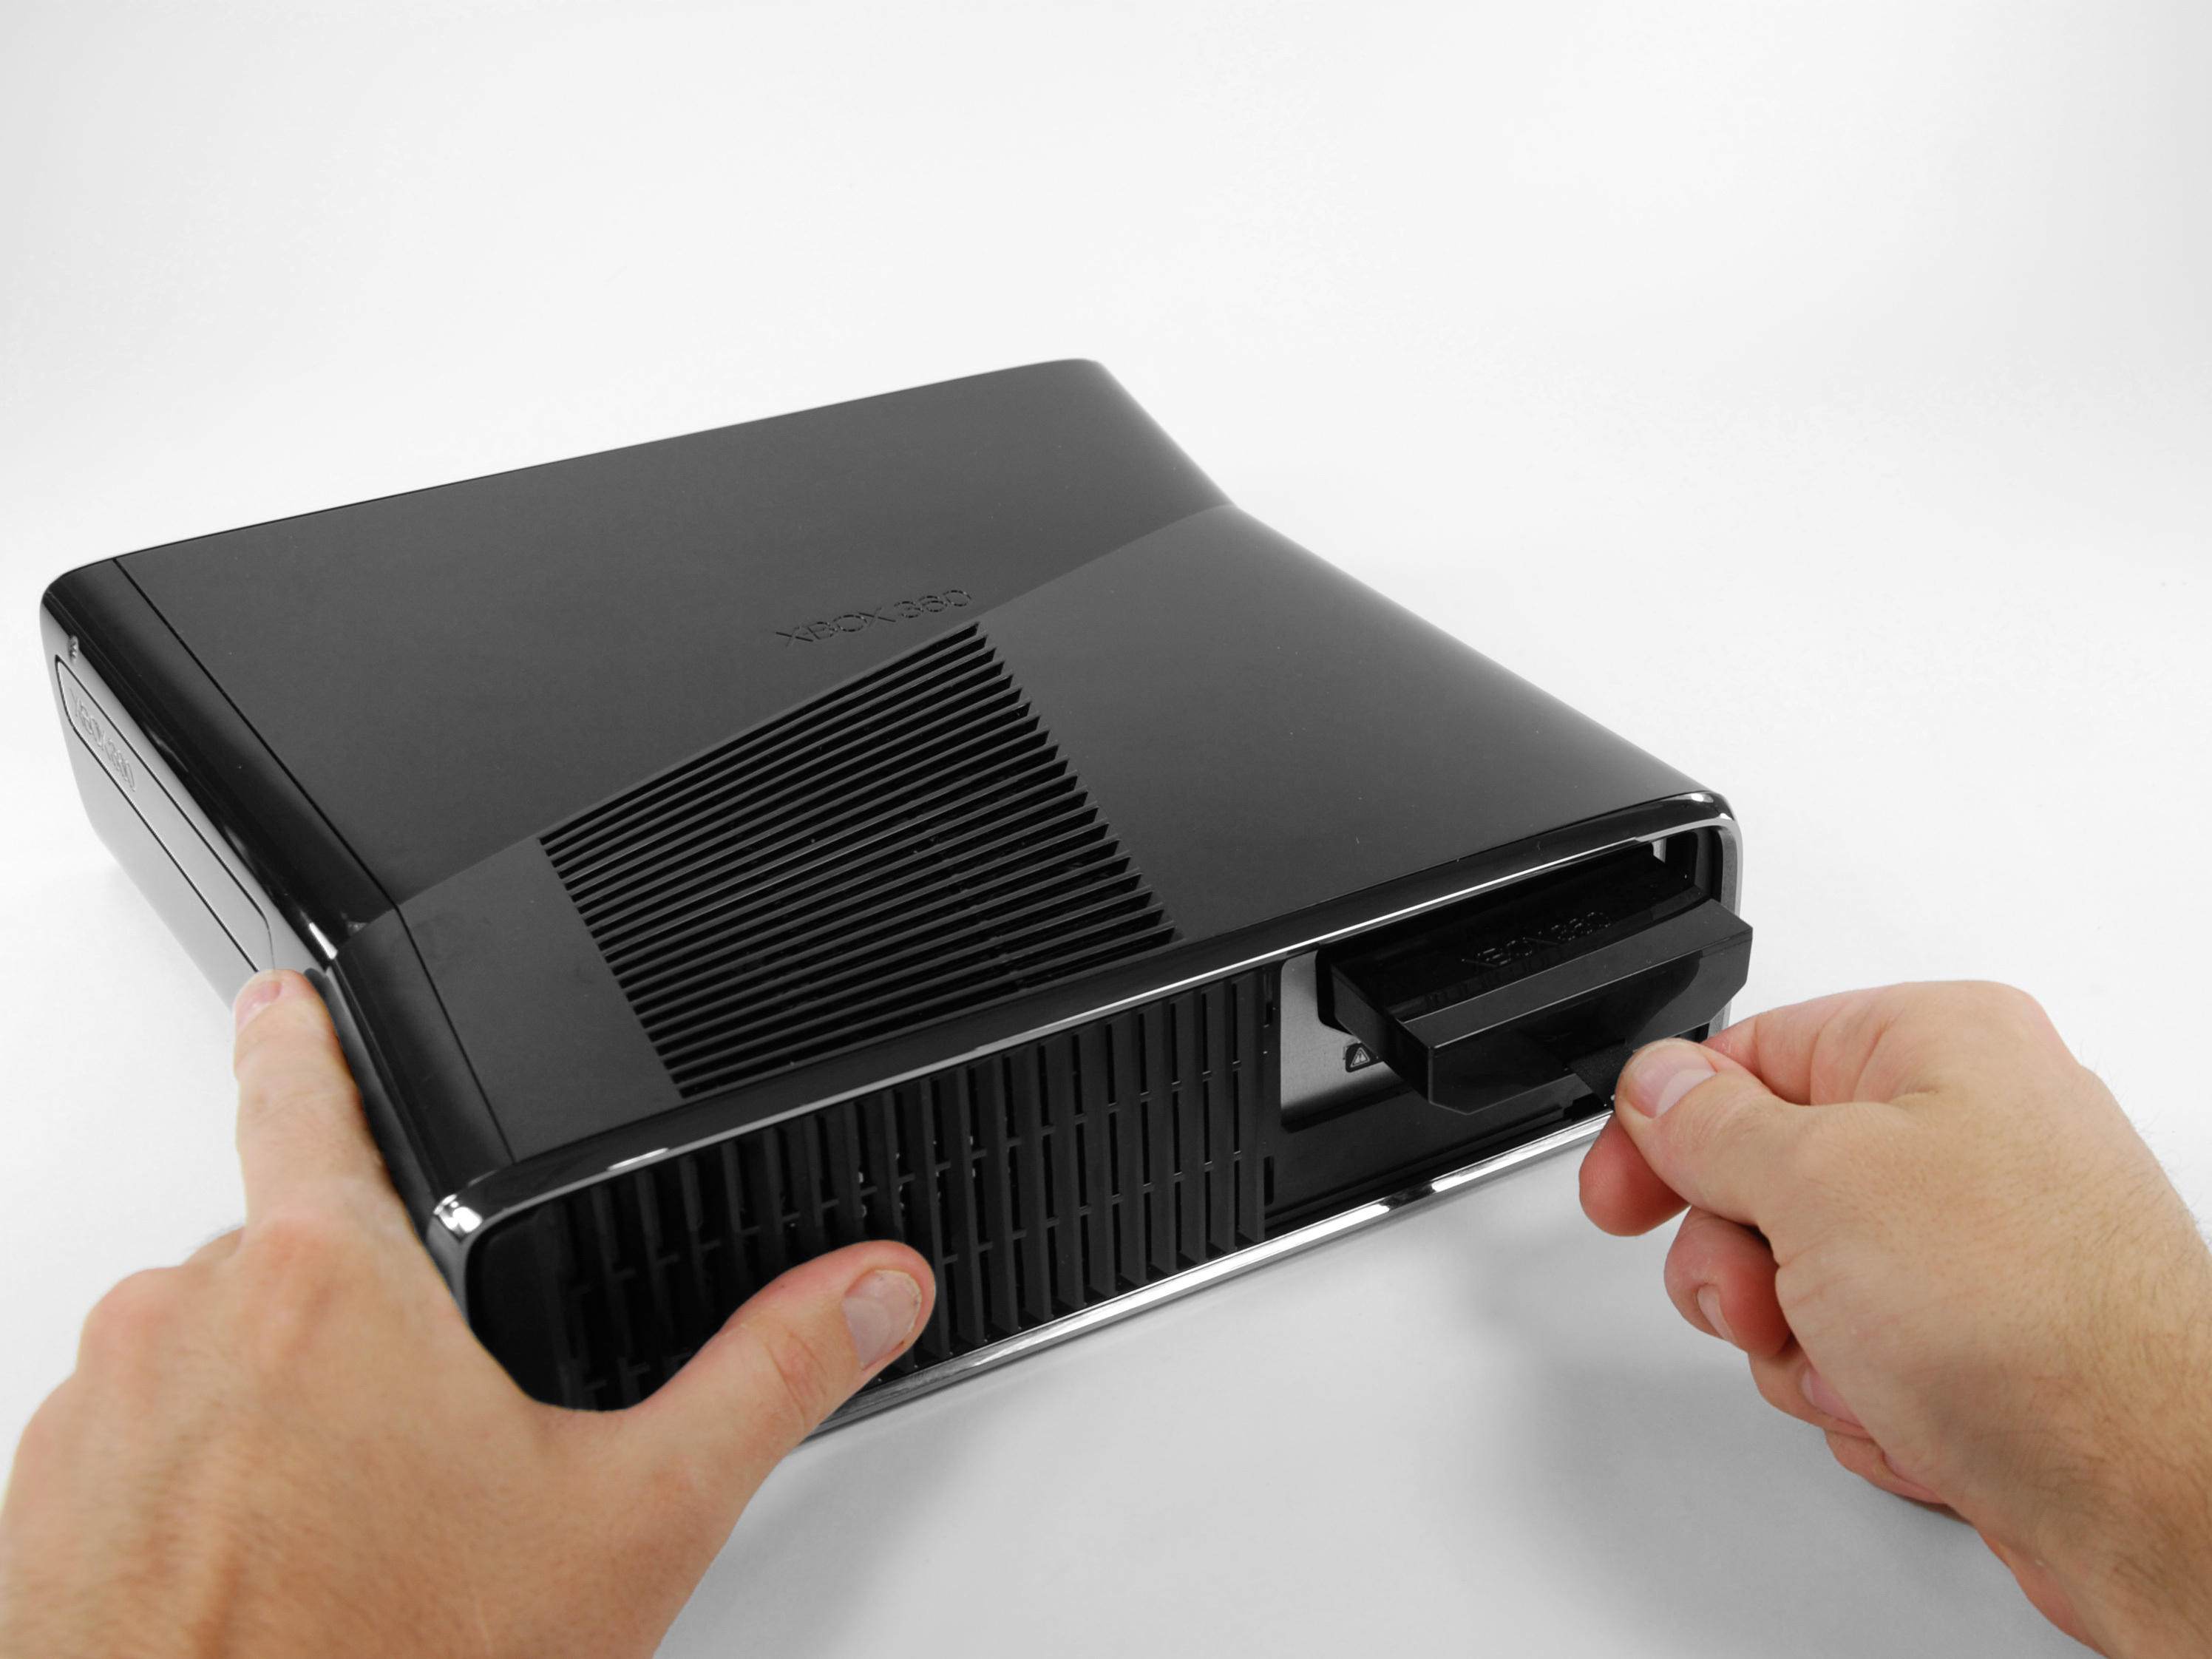 Xbox 360 4gb hard drive | ebay.